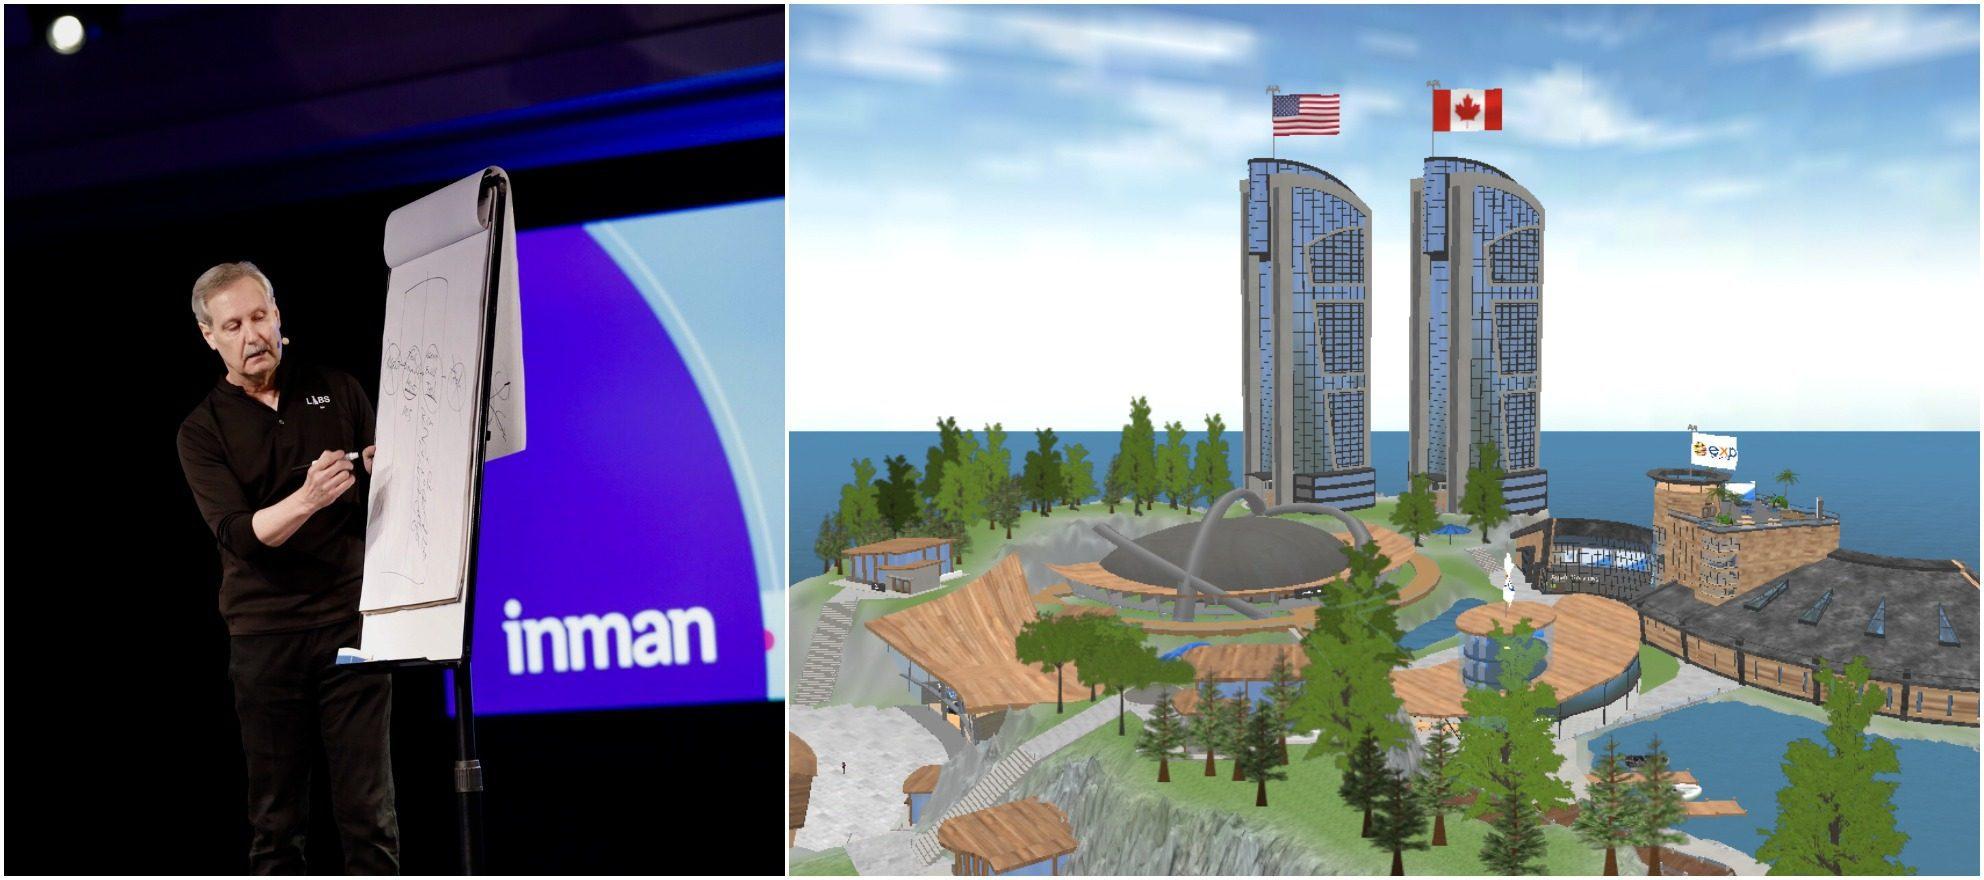 Gary Keller reportedly explored buying eXp's virtual world vendor